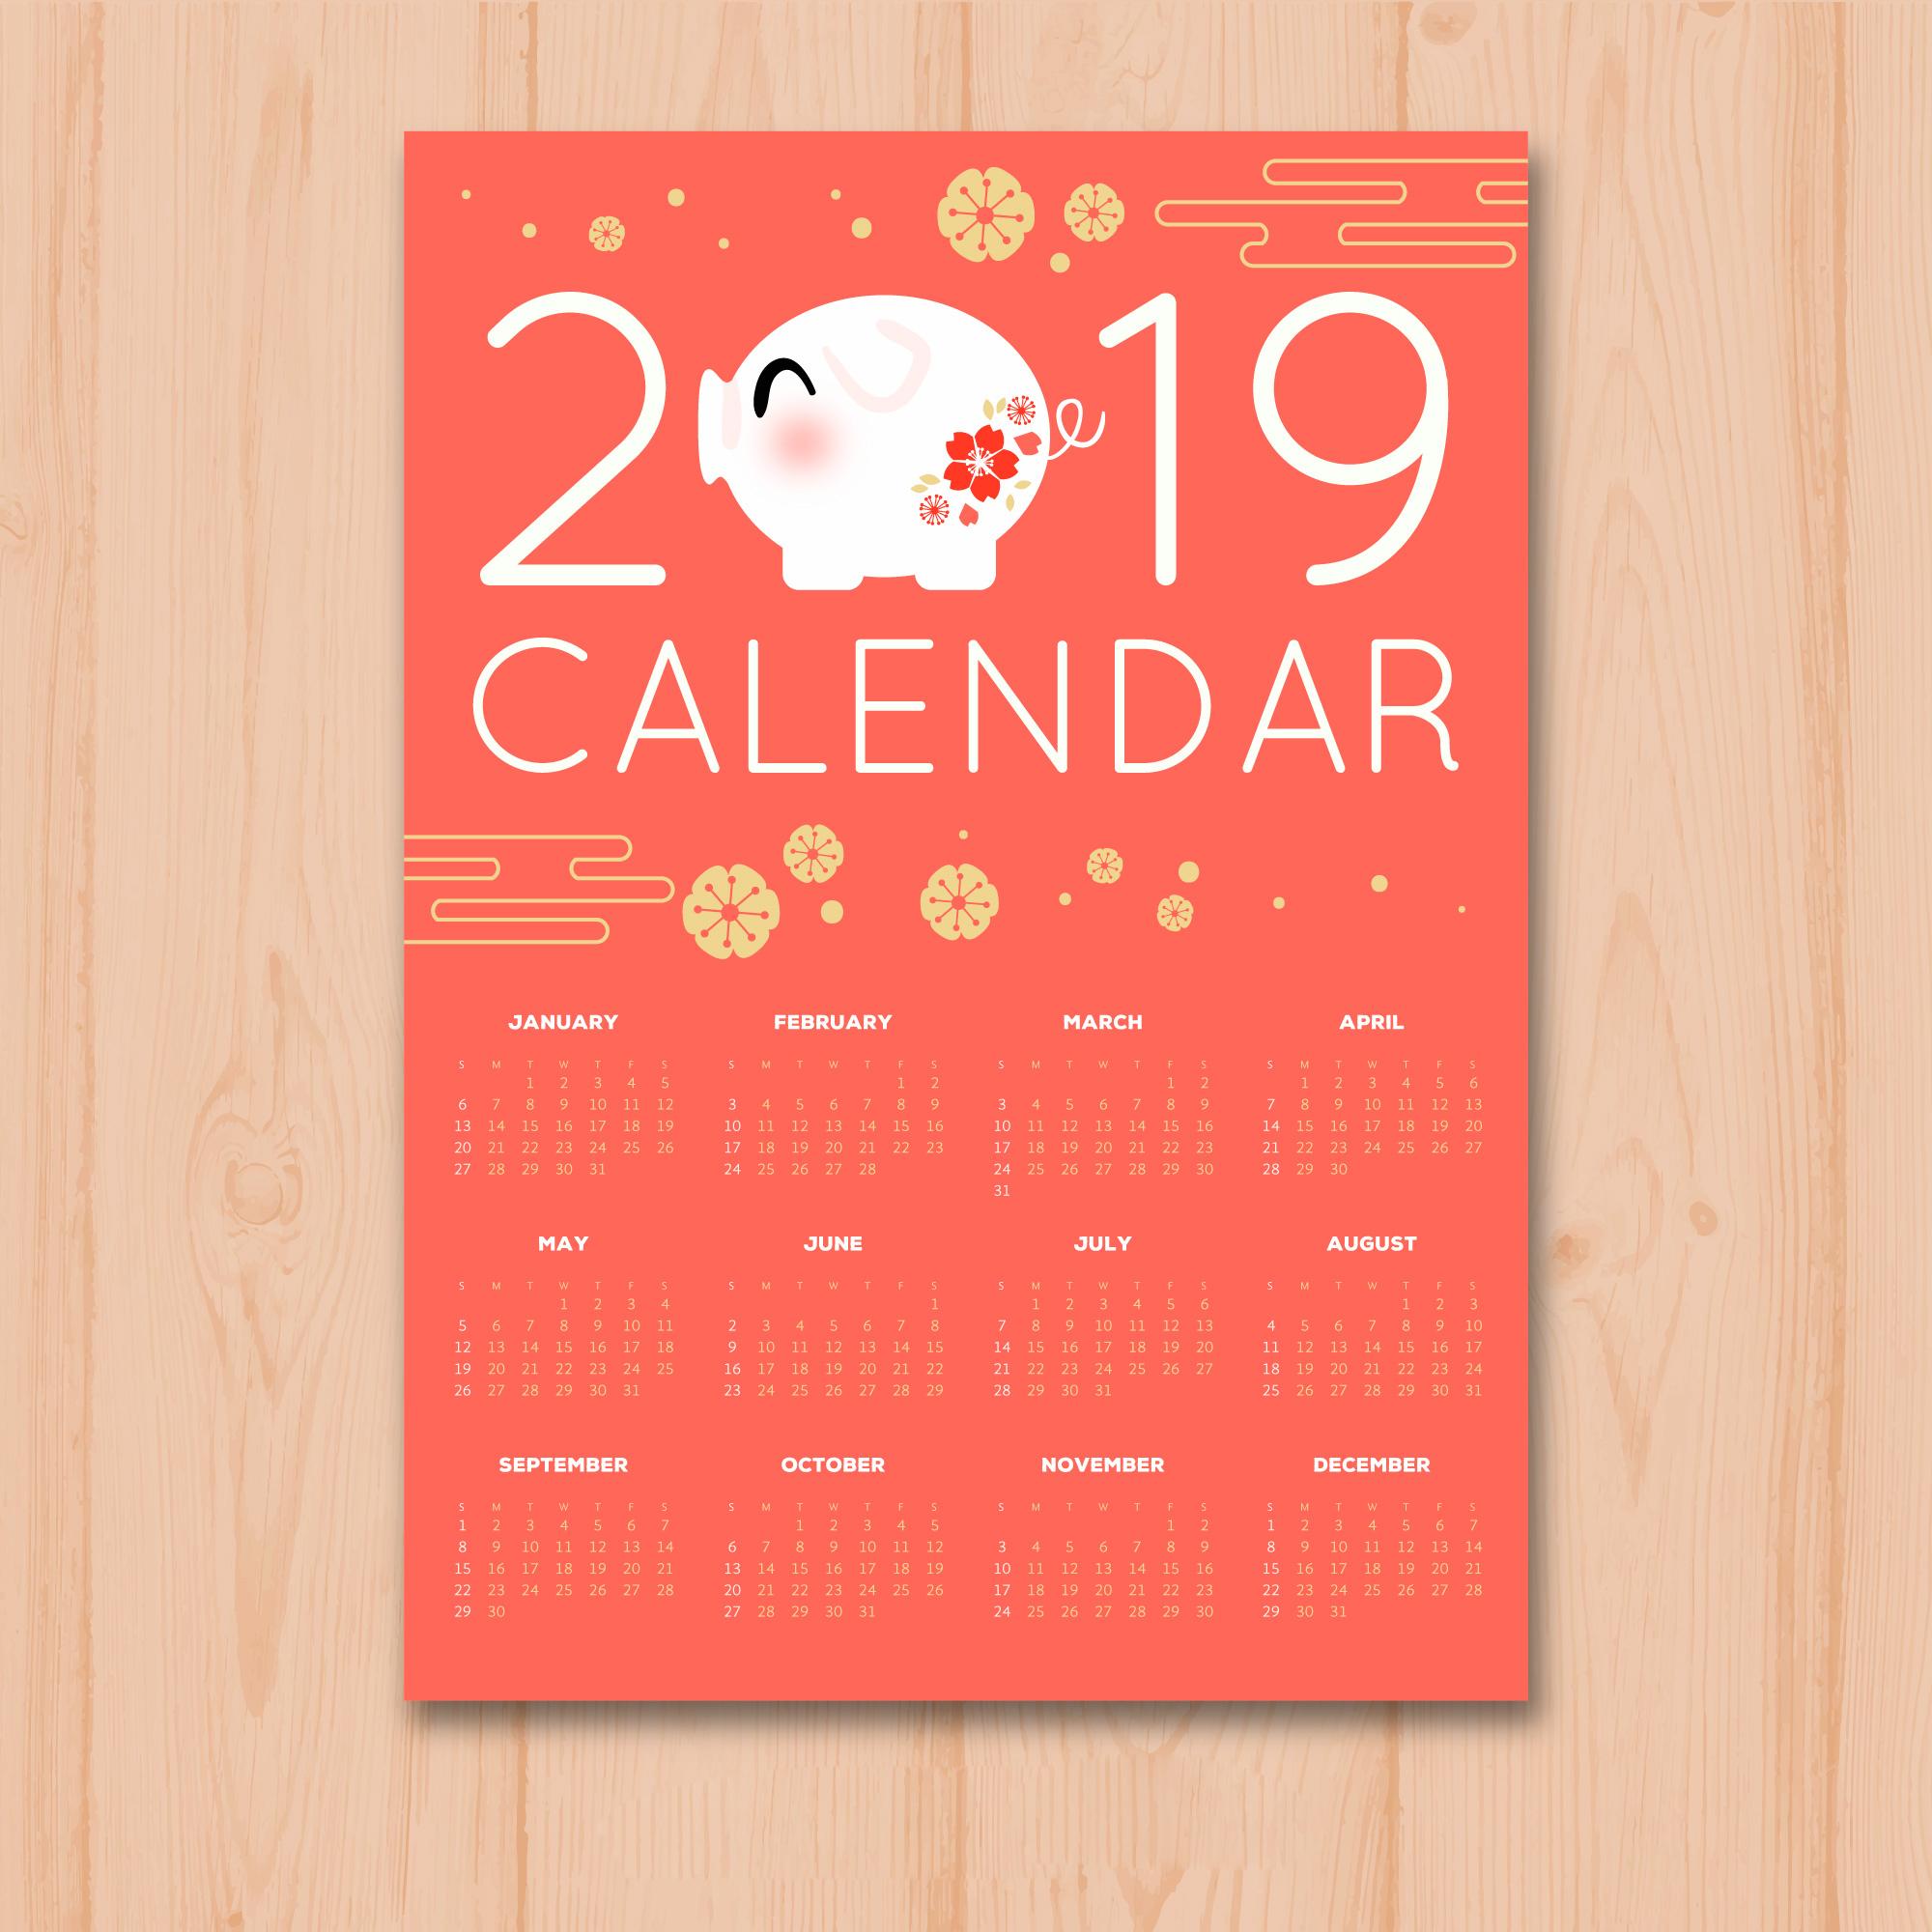 时尚简约的2019新年挂历日历矢量素材模板 Stylish Minimalist 2019 New Year Calendar Calendar Vector Material Template插图(7)